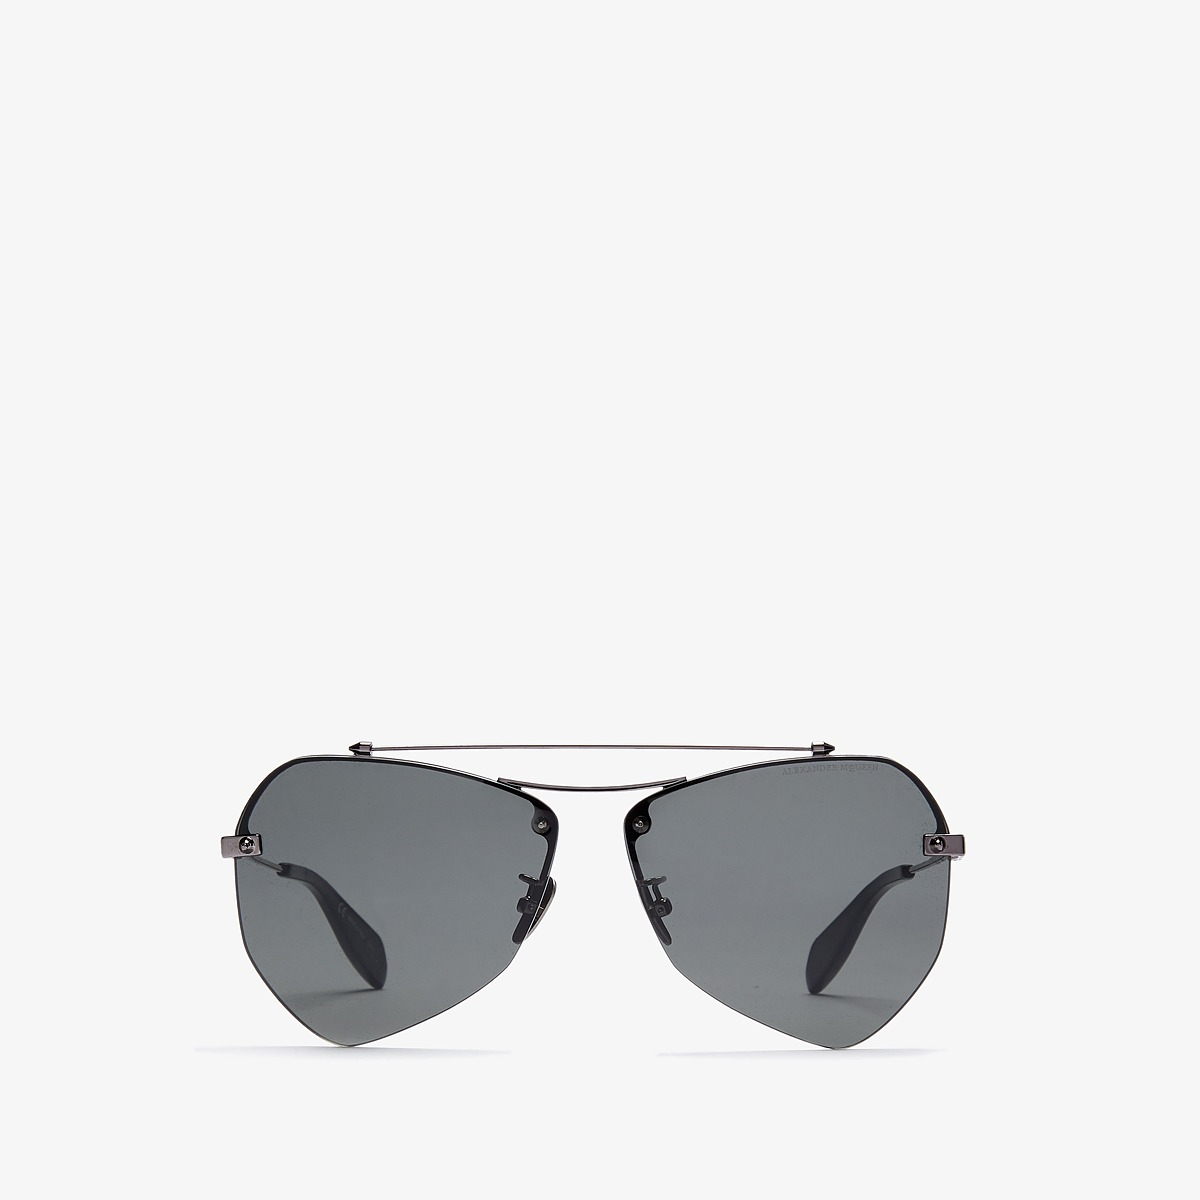 Alexander McQueen - AM0121SA (Dark Ruthenium/Grey) Fashion Sunglasses